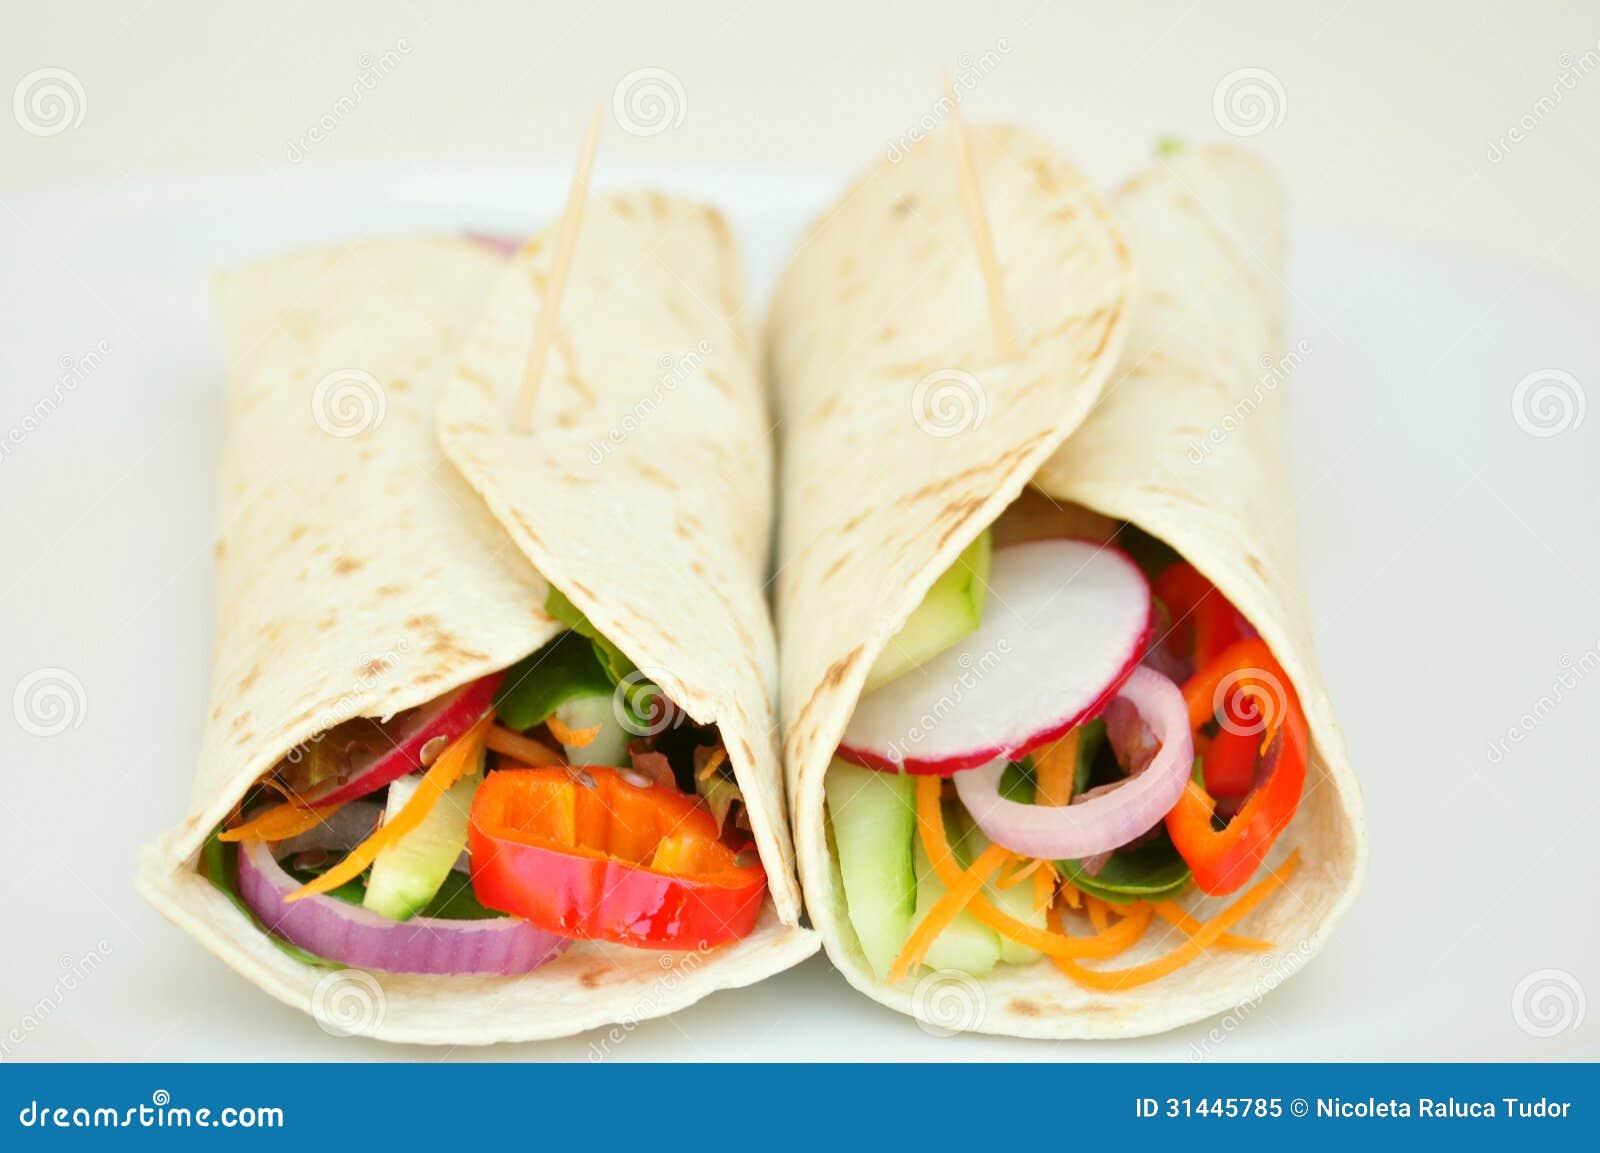 Vegan Wraps With Fresh, Raw Vegetables Stock Image - Image